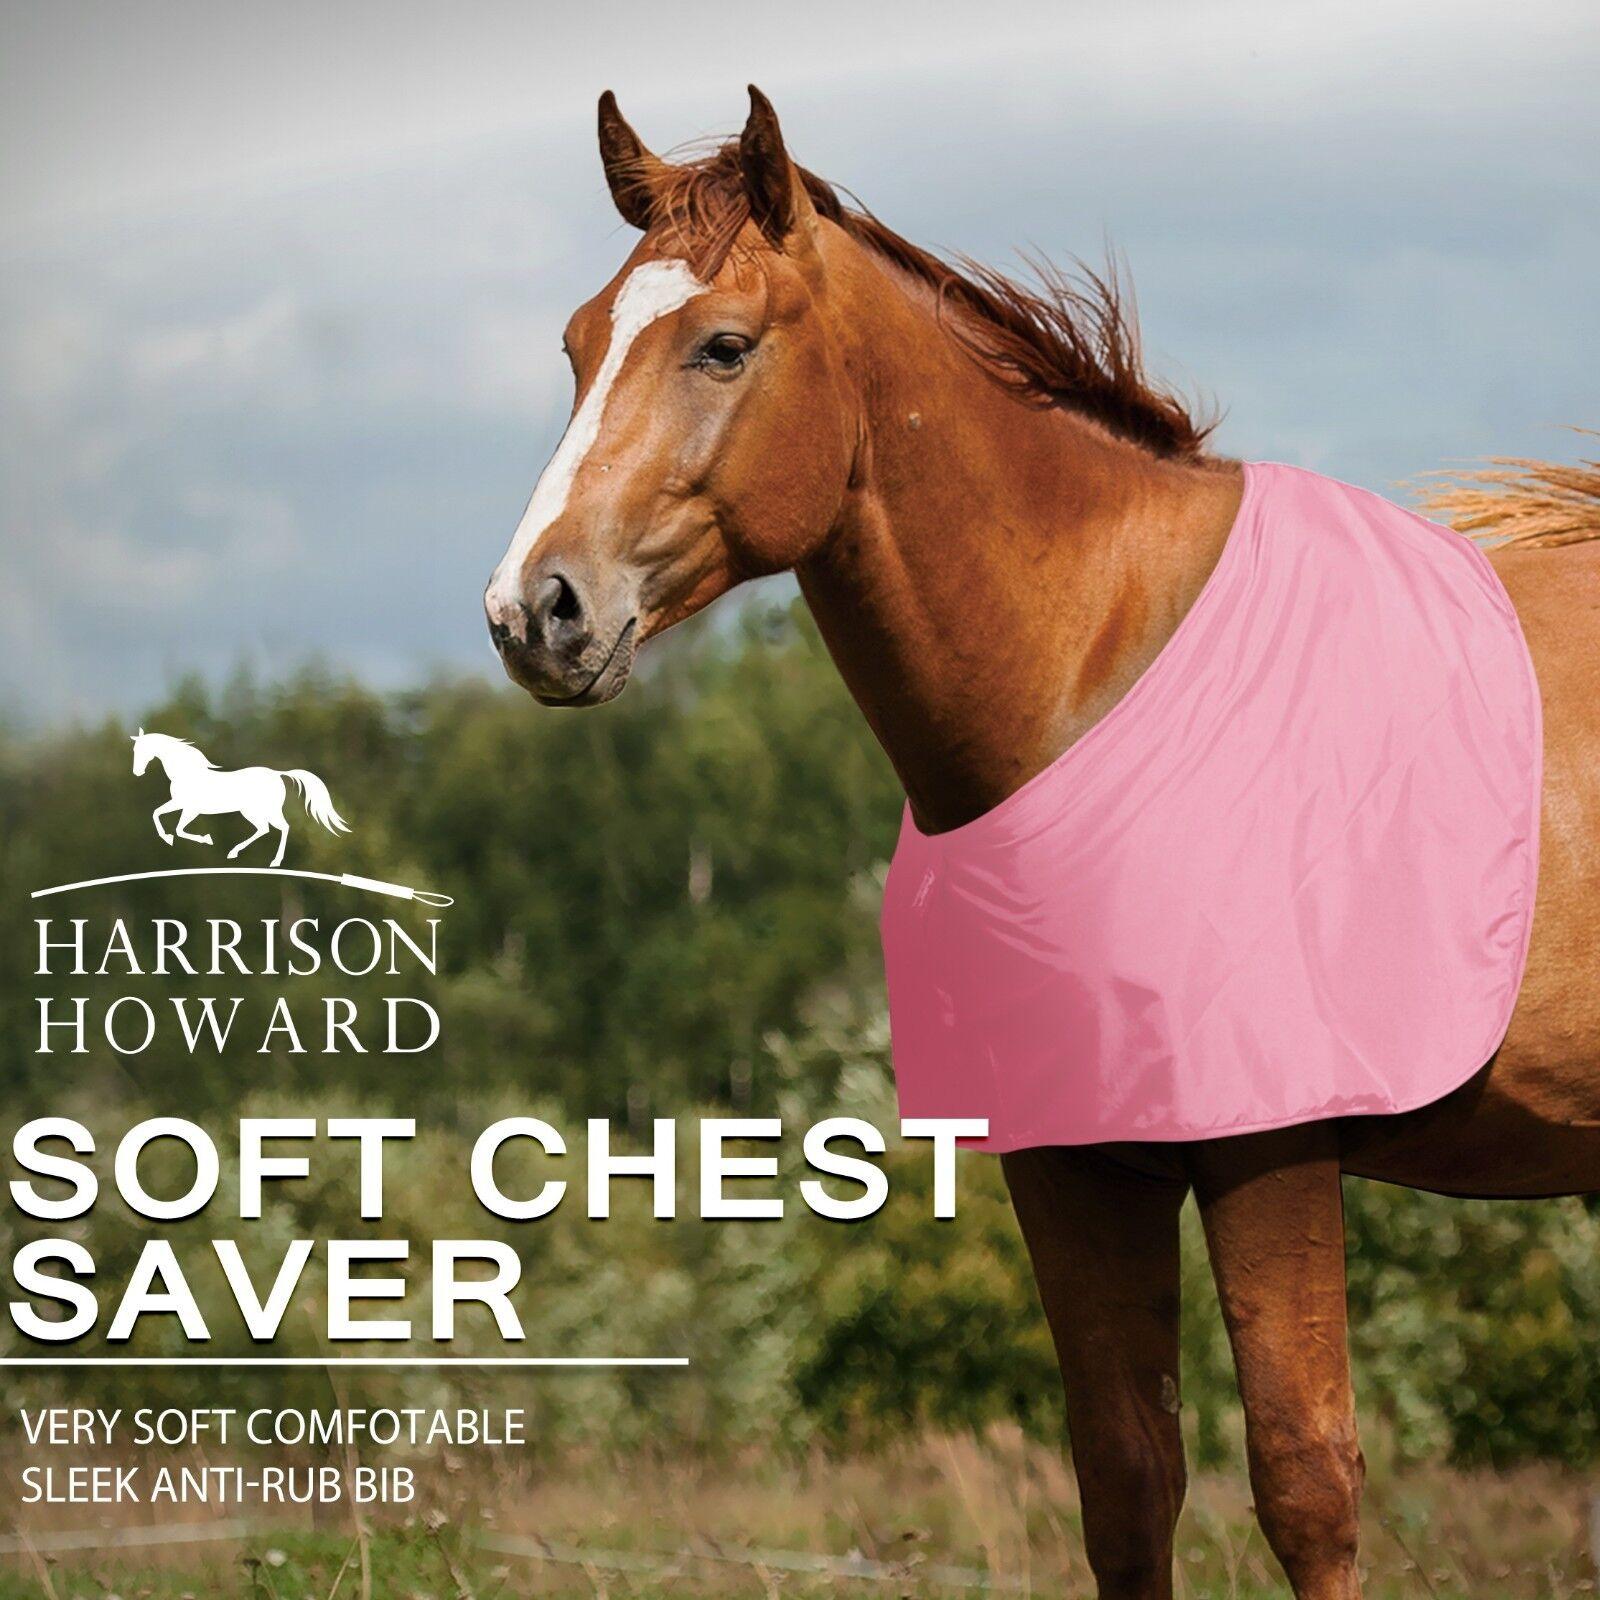 shoulder wither vest Bib rub Anti horse Howard guard